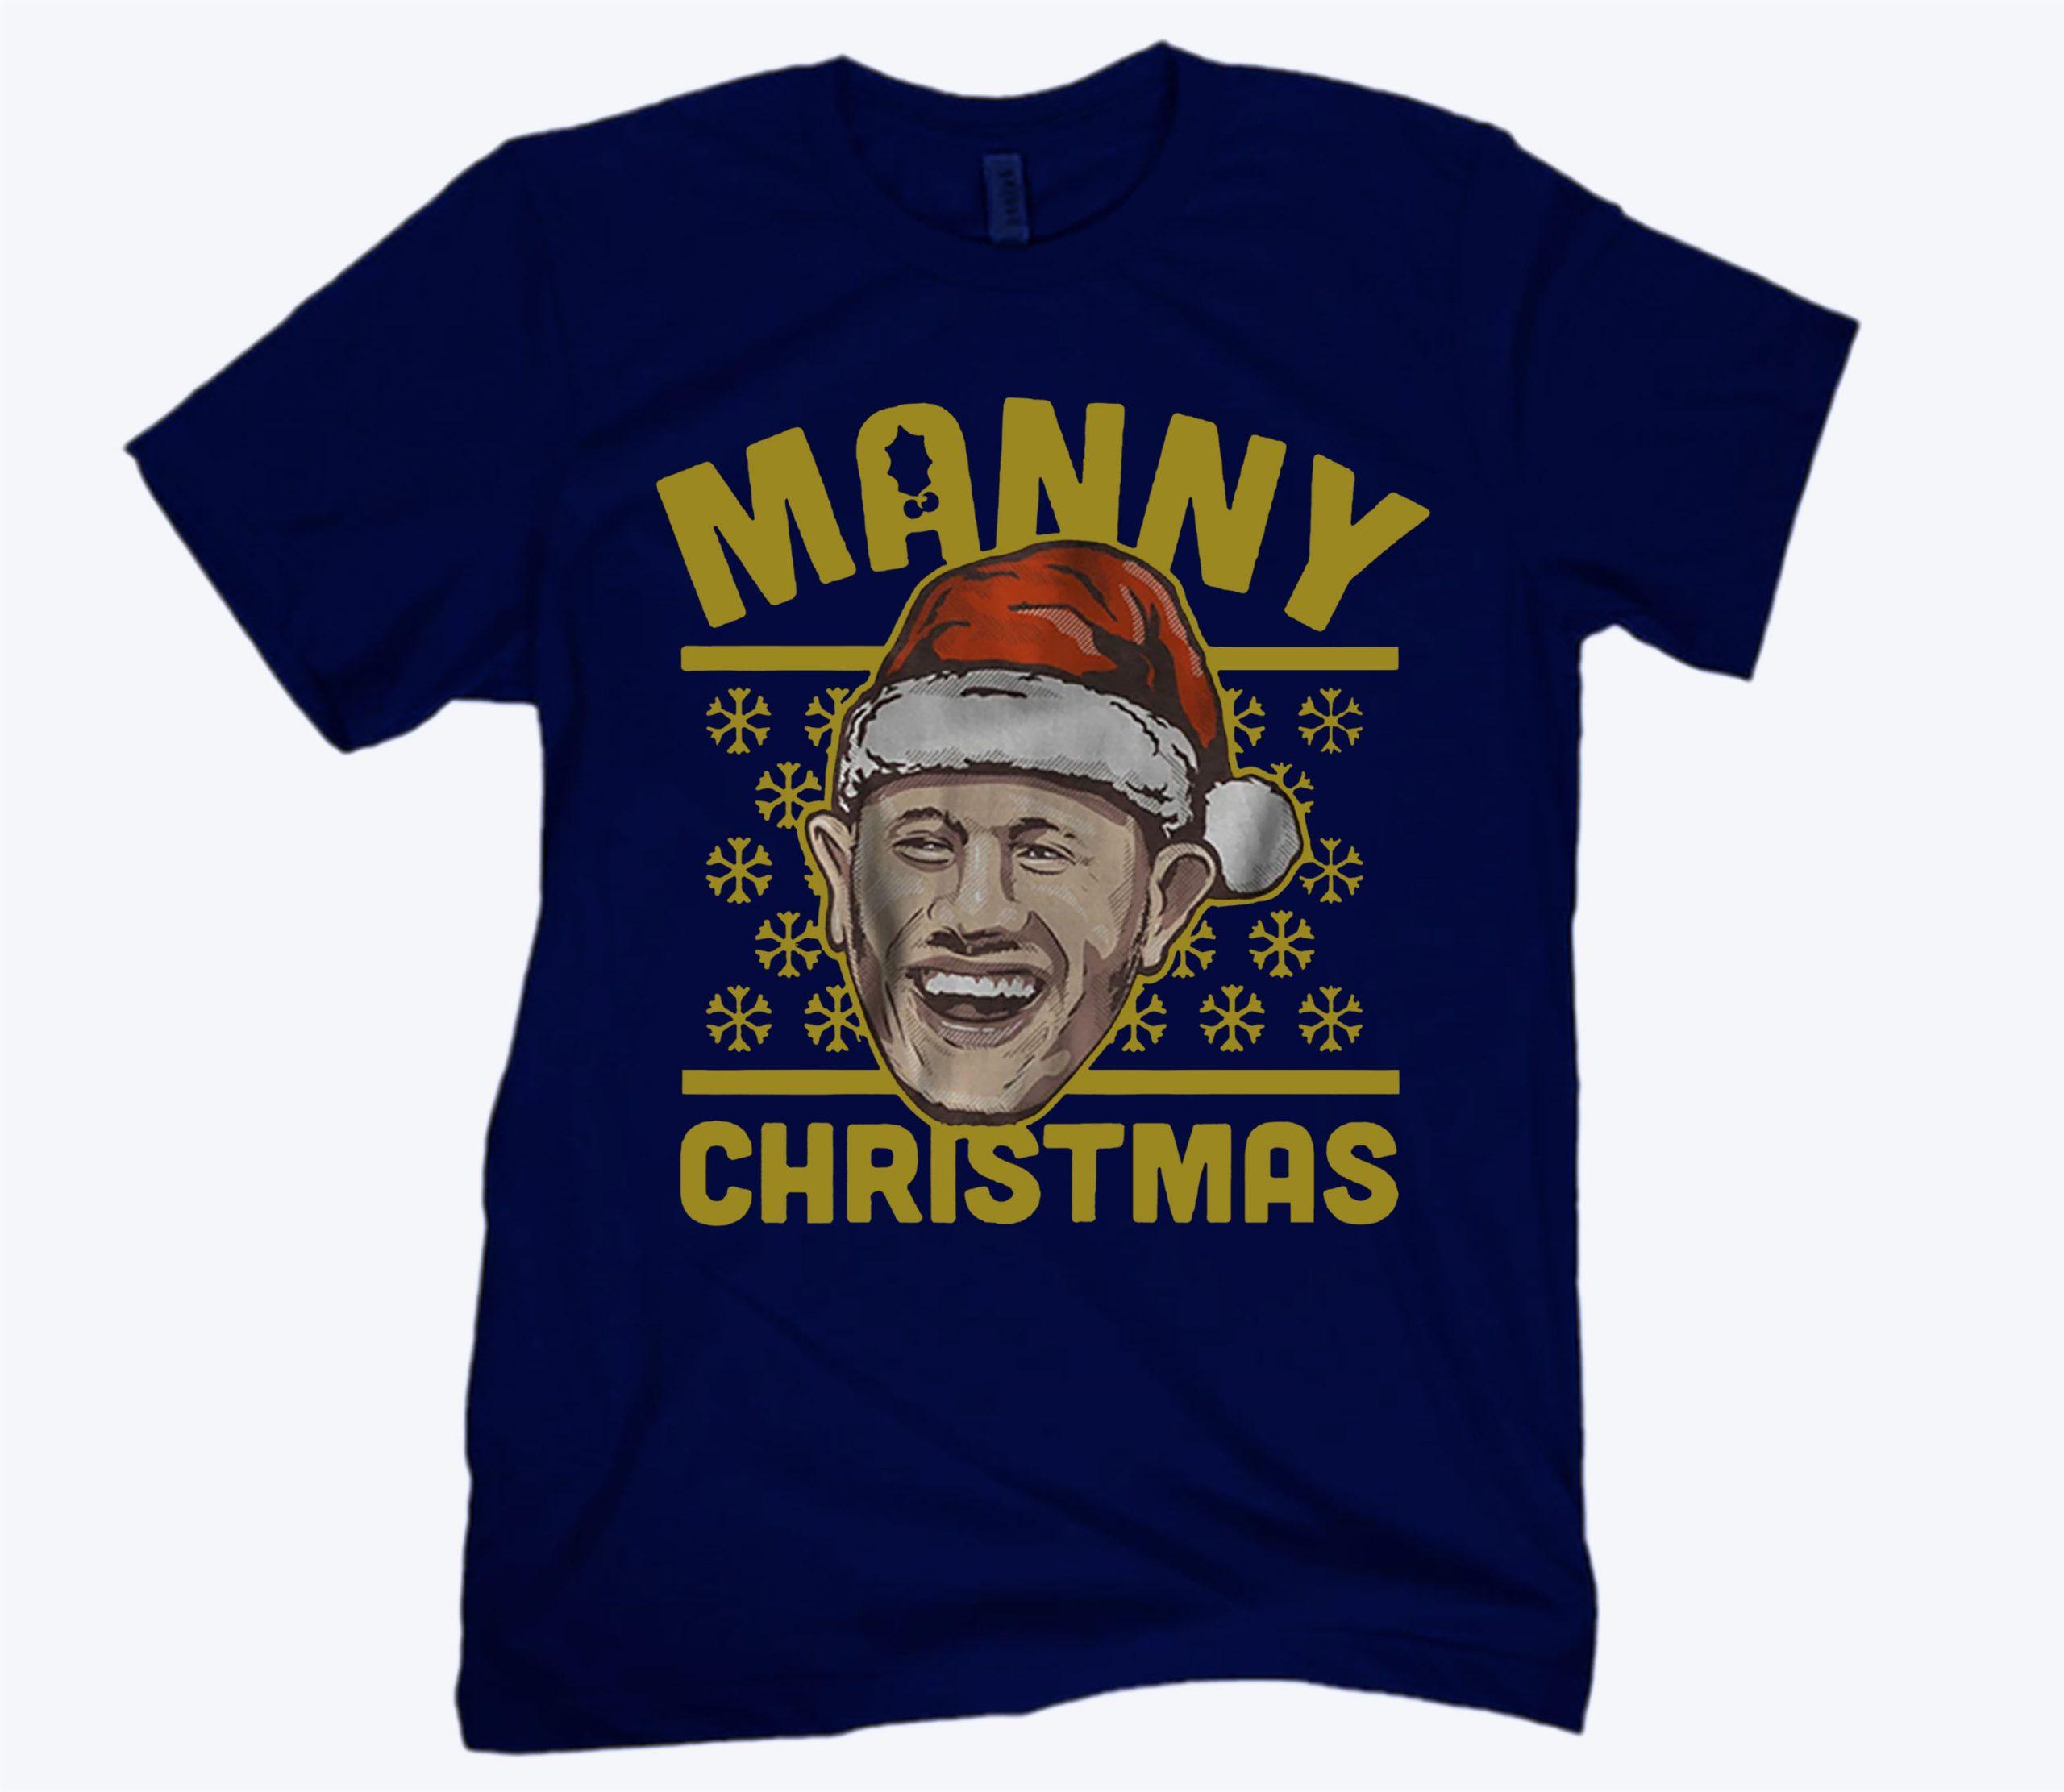 San Diego Manny Christmas Shirt